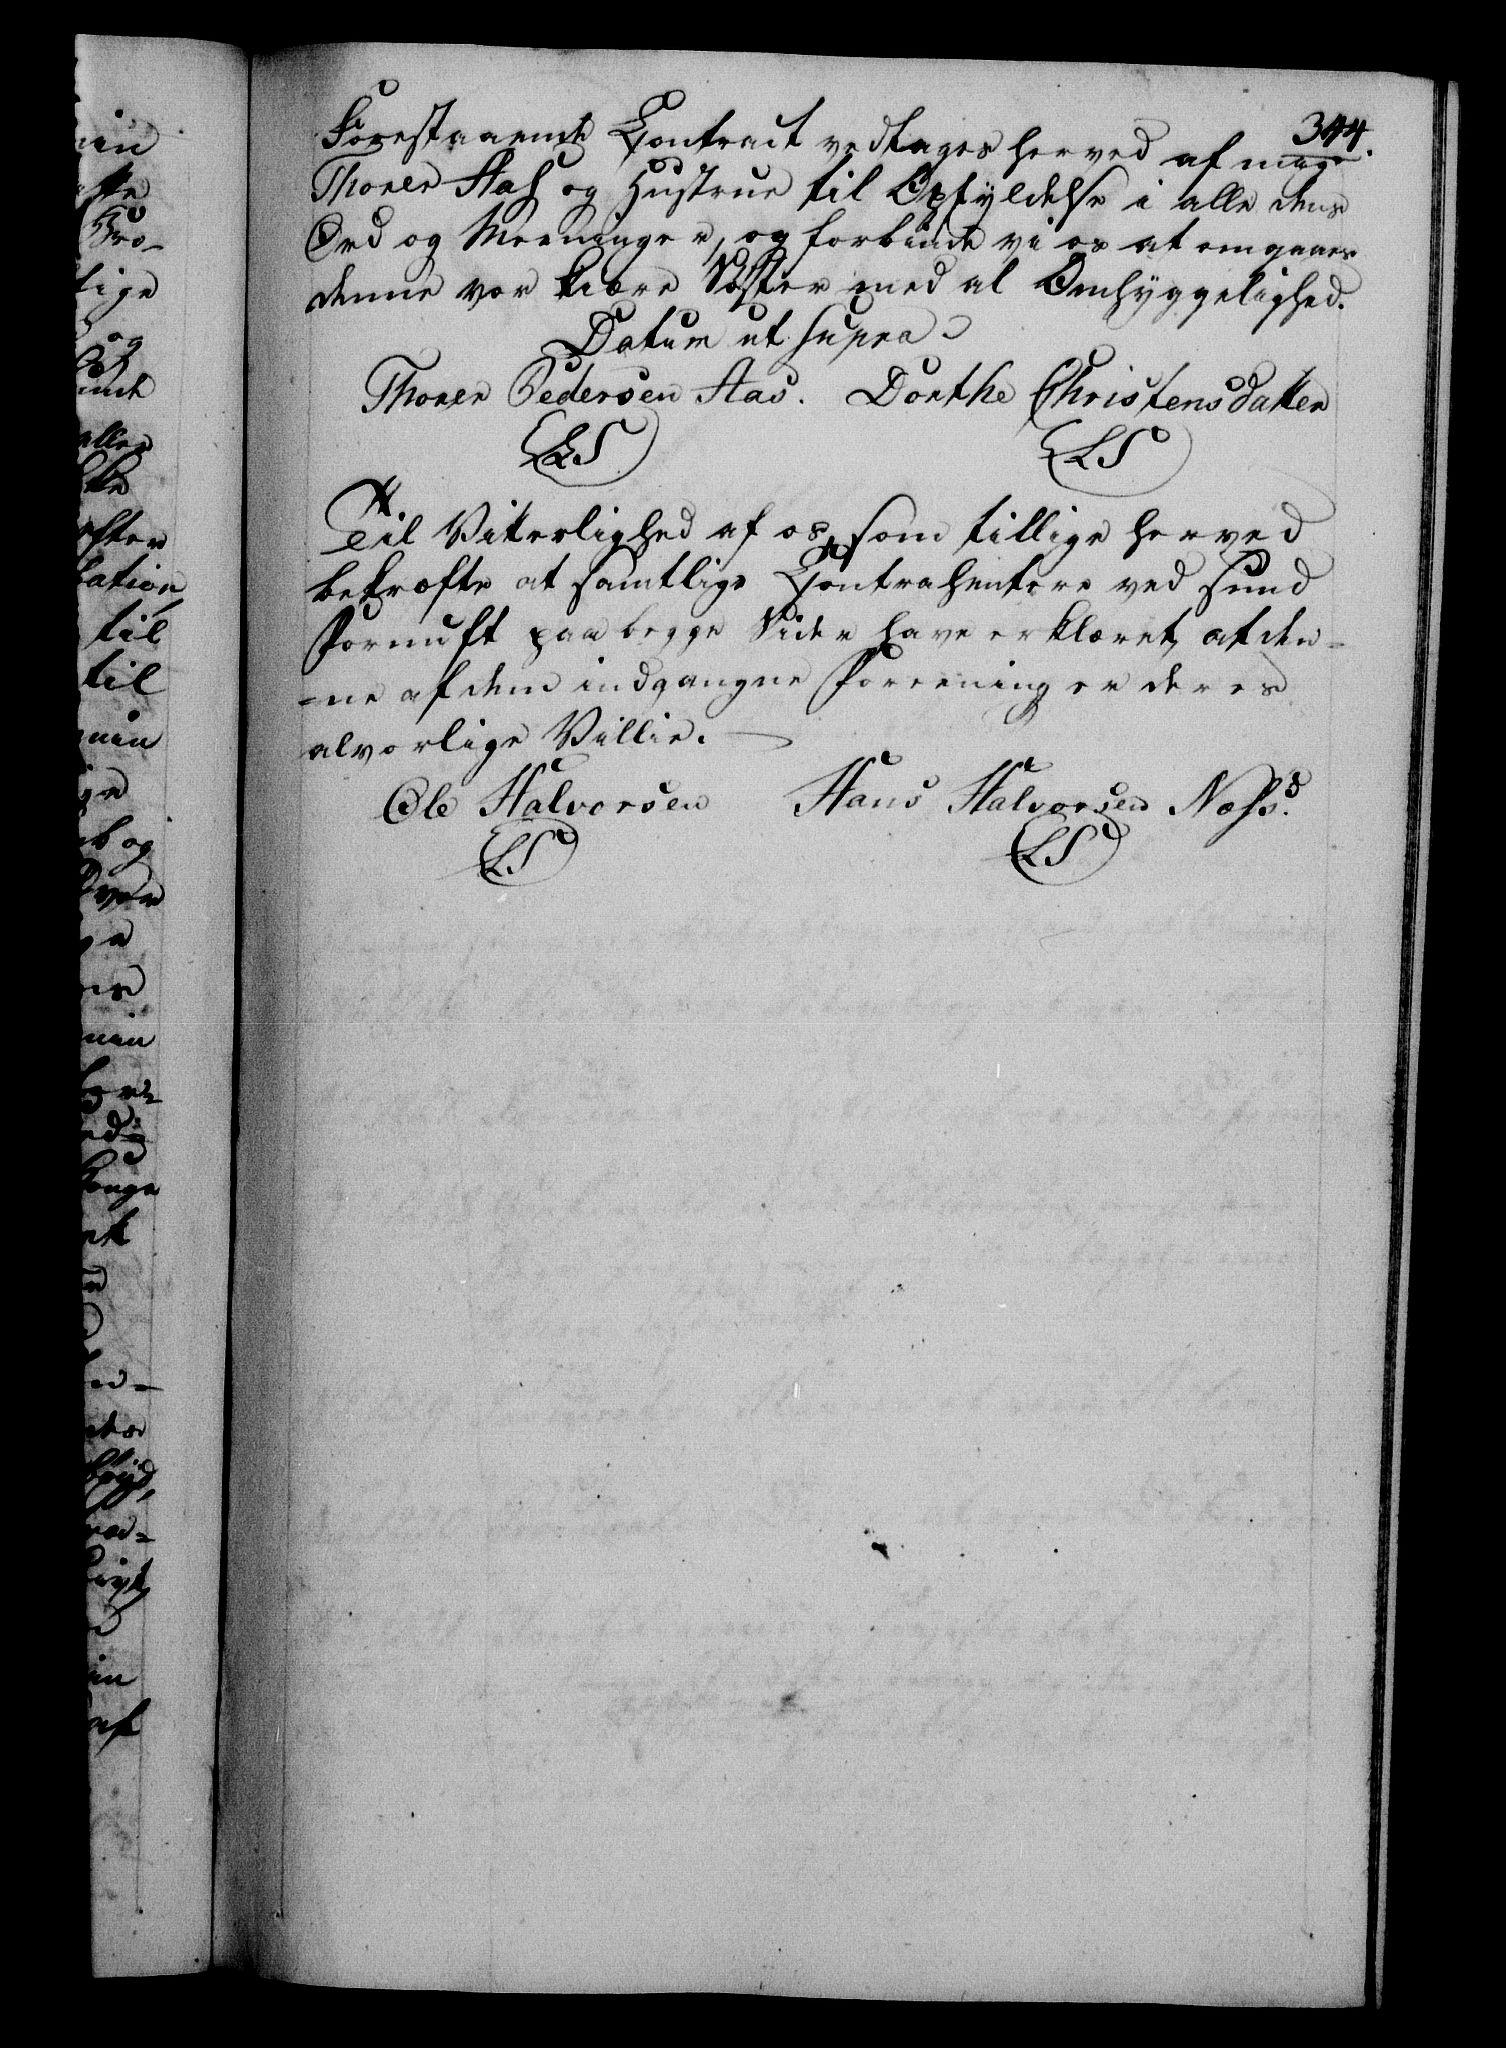 RA, Danske Kanselli 1800-1814, H/Hf/Hfb/Hfba/L0001: Registranter, 1800-1801, s. 344a